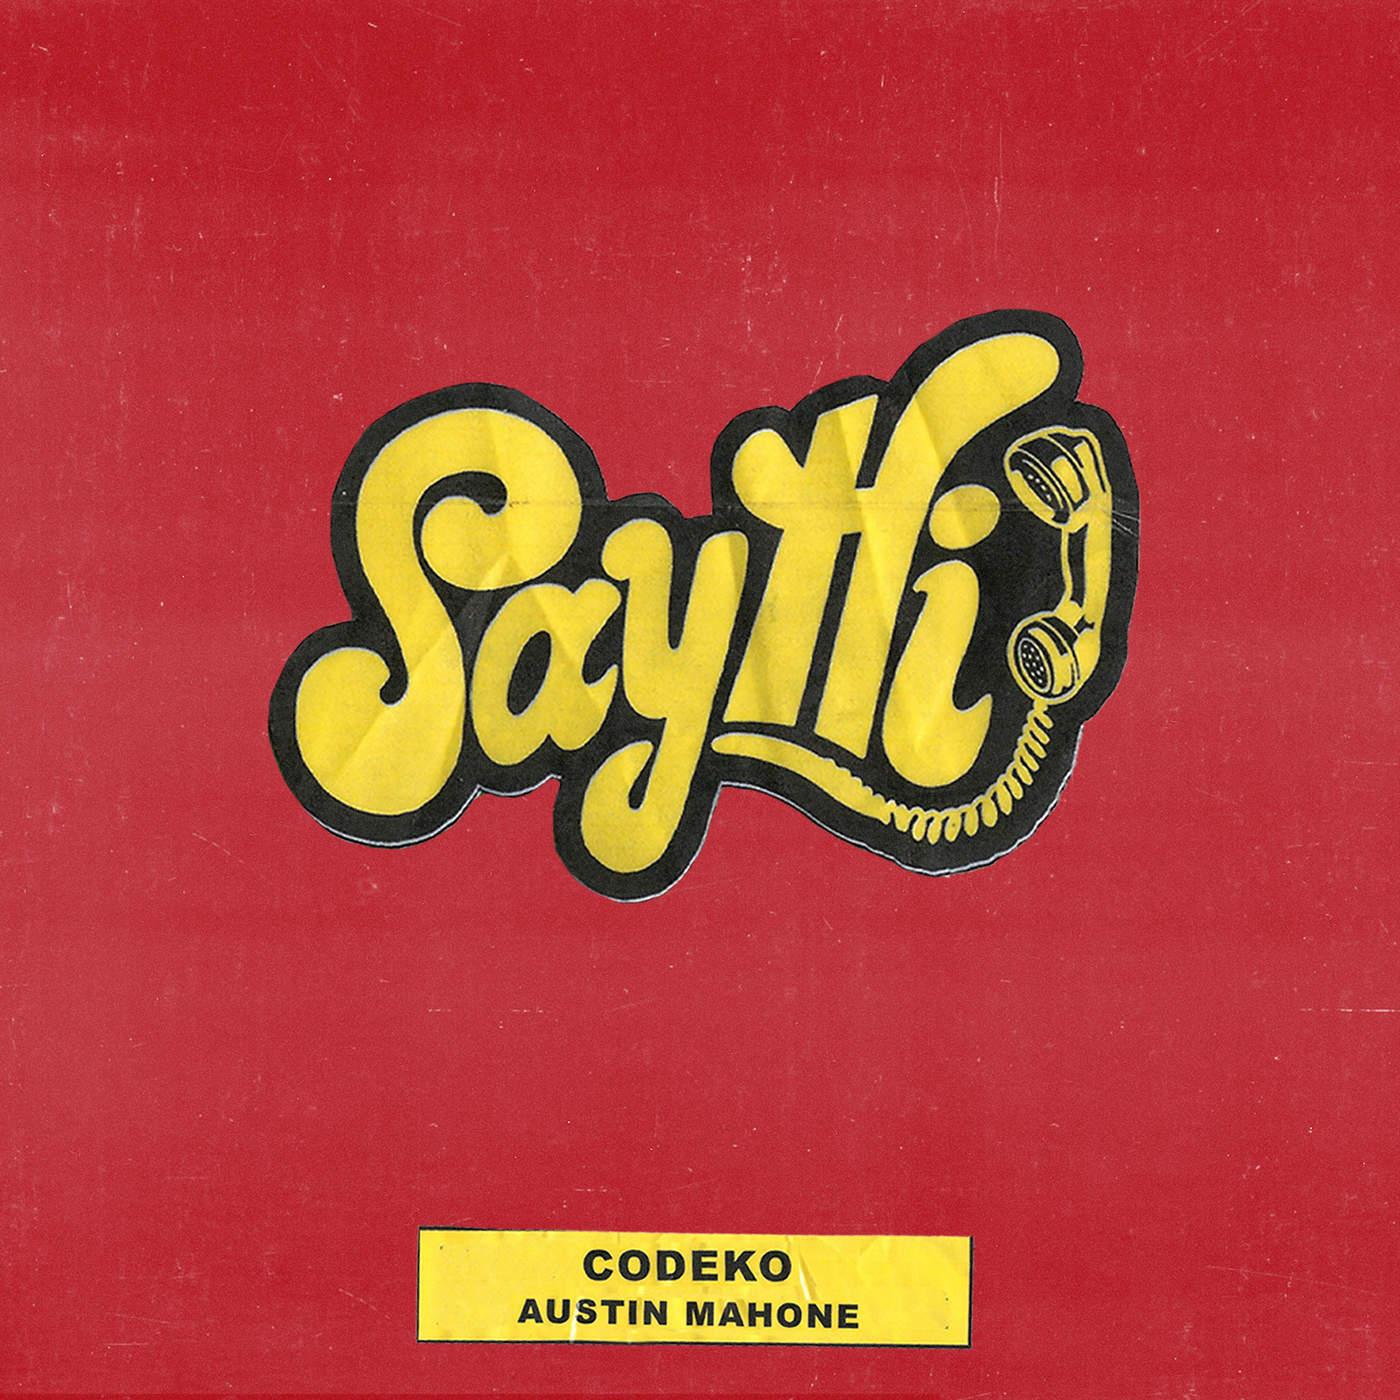 Codeko & Austin Mahone - Say Hi - Single